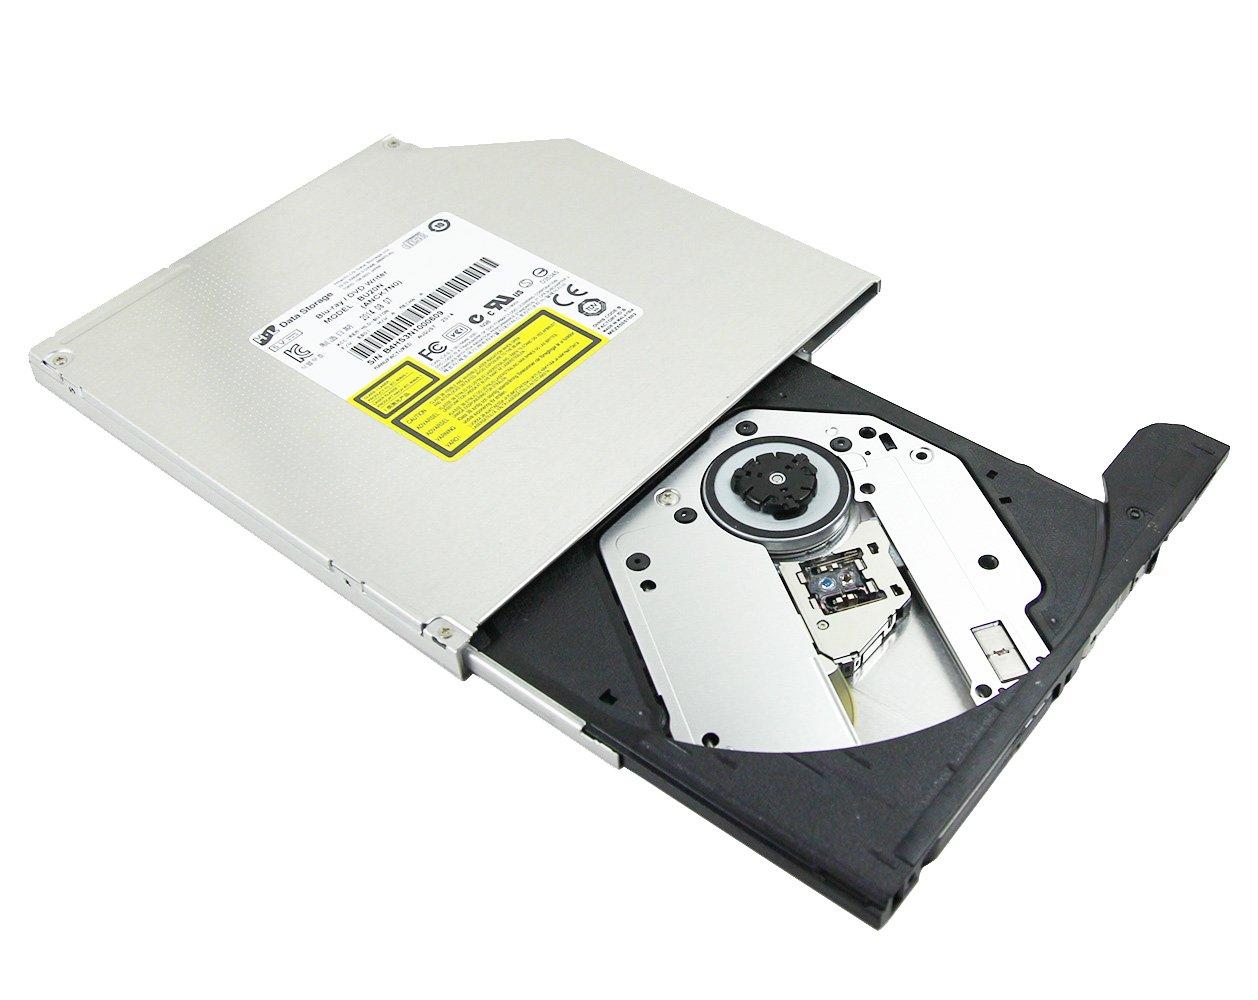 For Lenovo IdeaPad Y510p Y410P Y500 6X 3D Blu-ray BD-RE Burner Drive UJ262